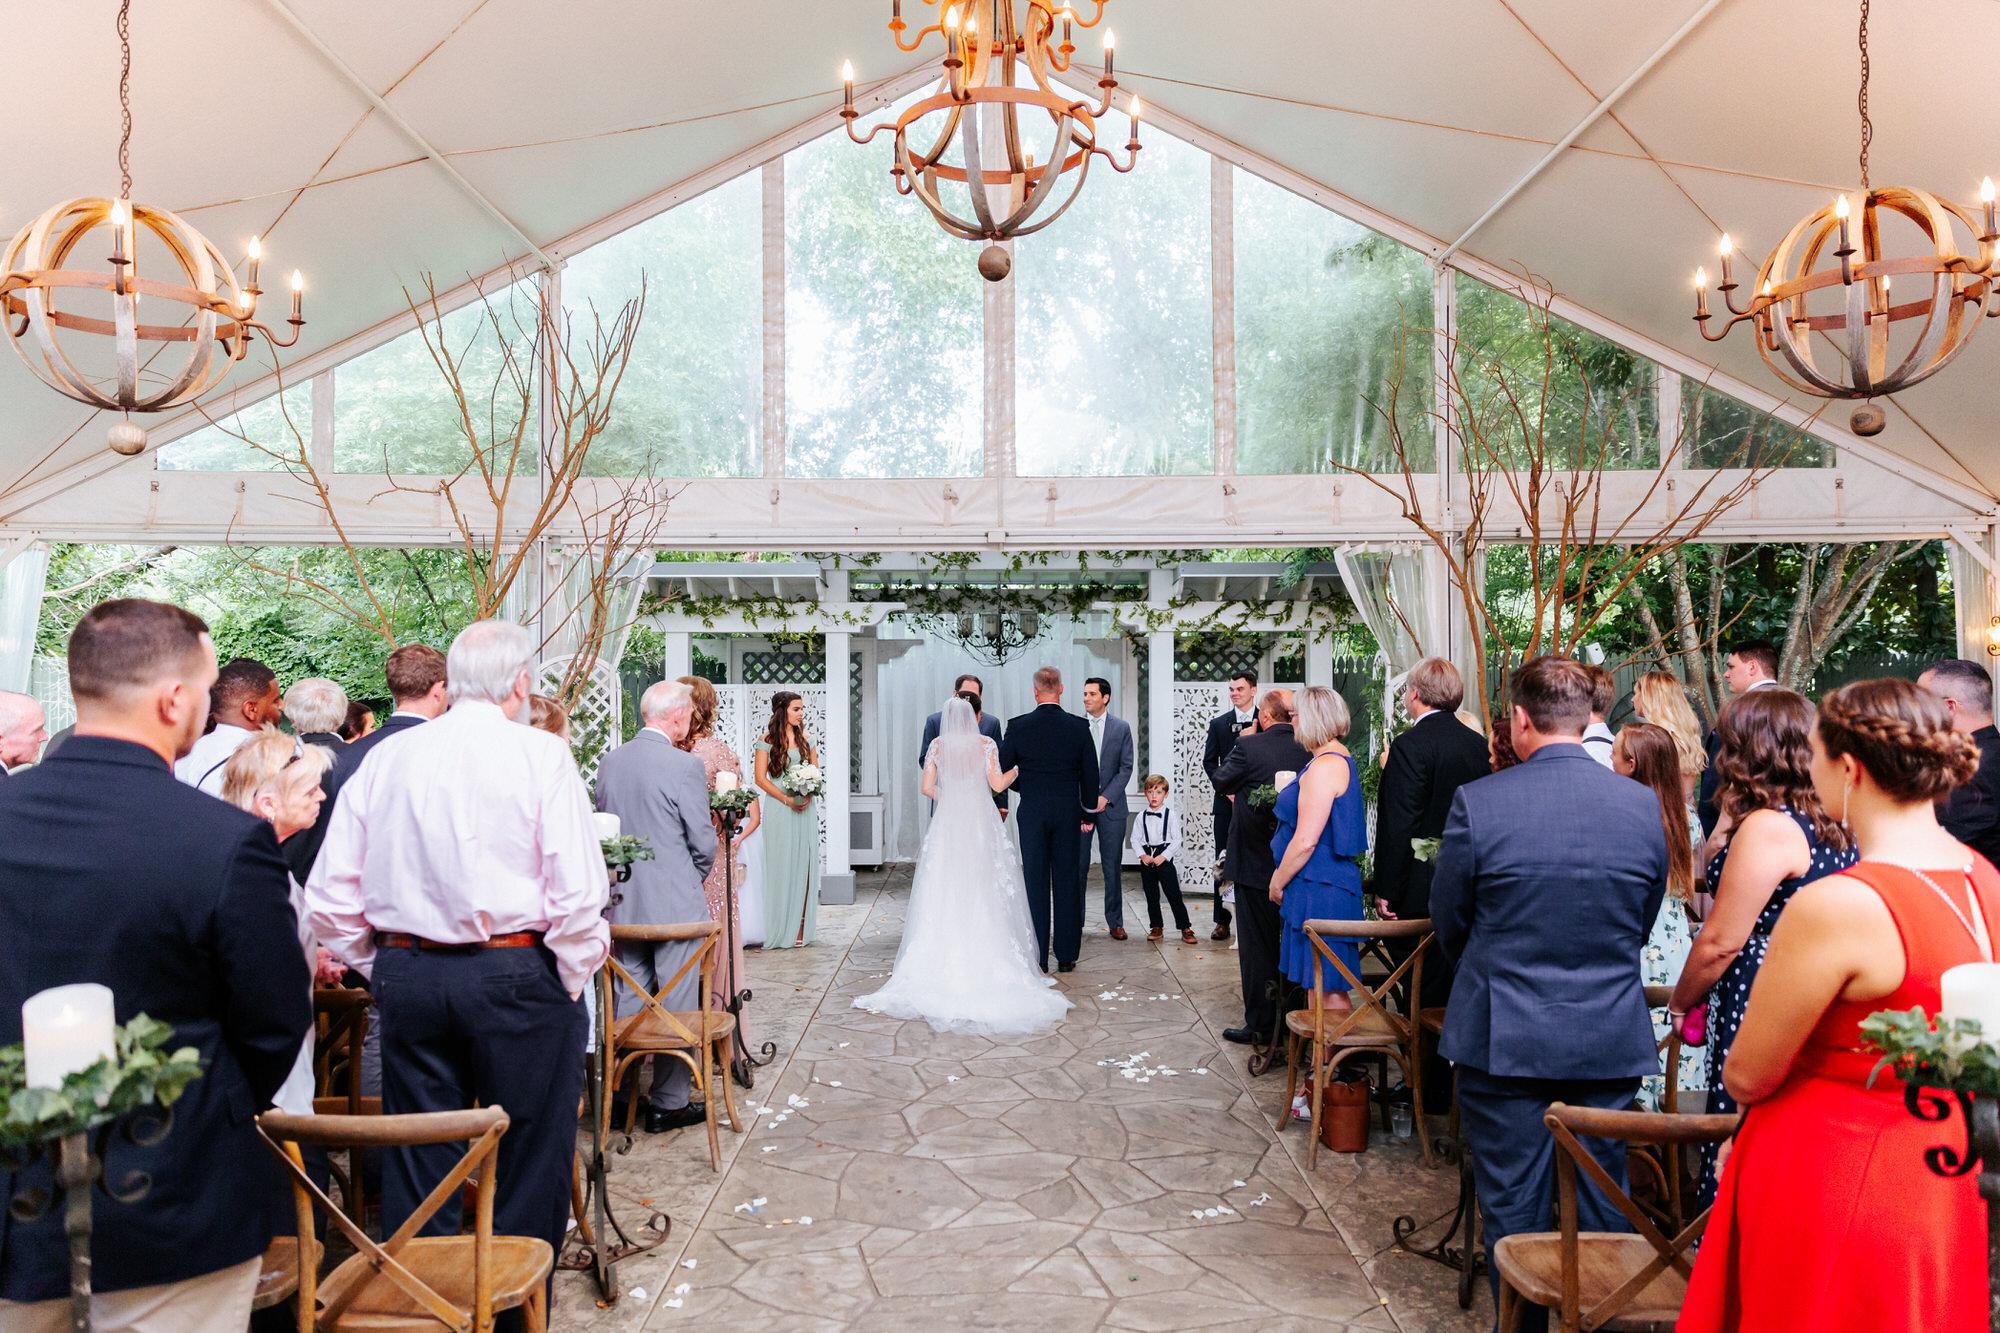 twigs-tempietto-wedding-greenville-downtown-342.JPG